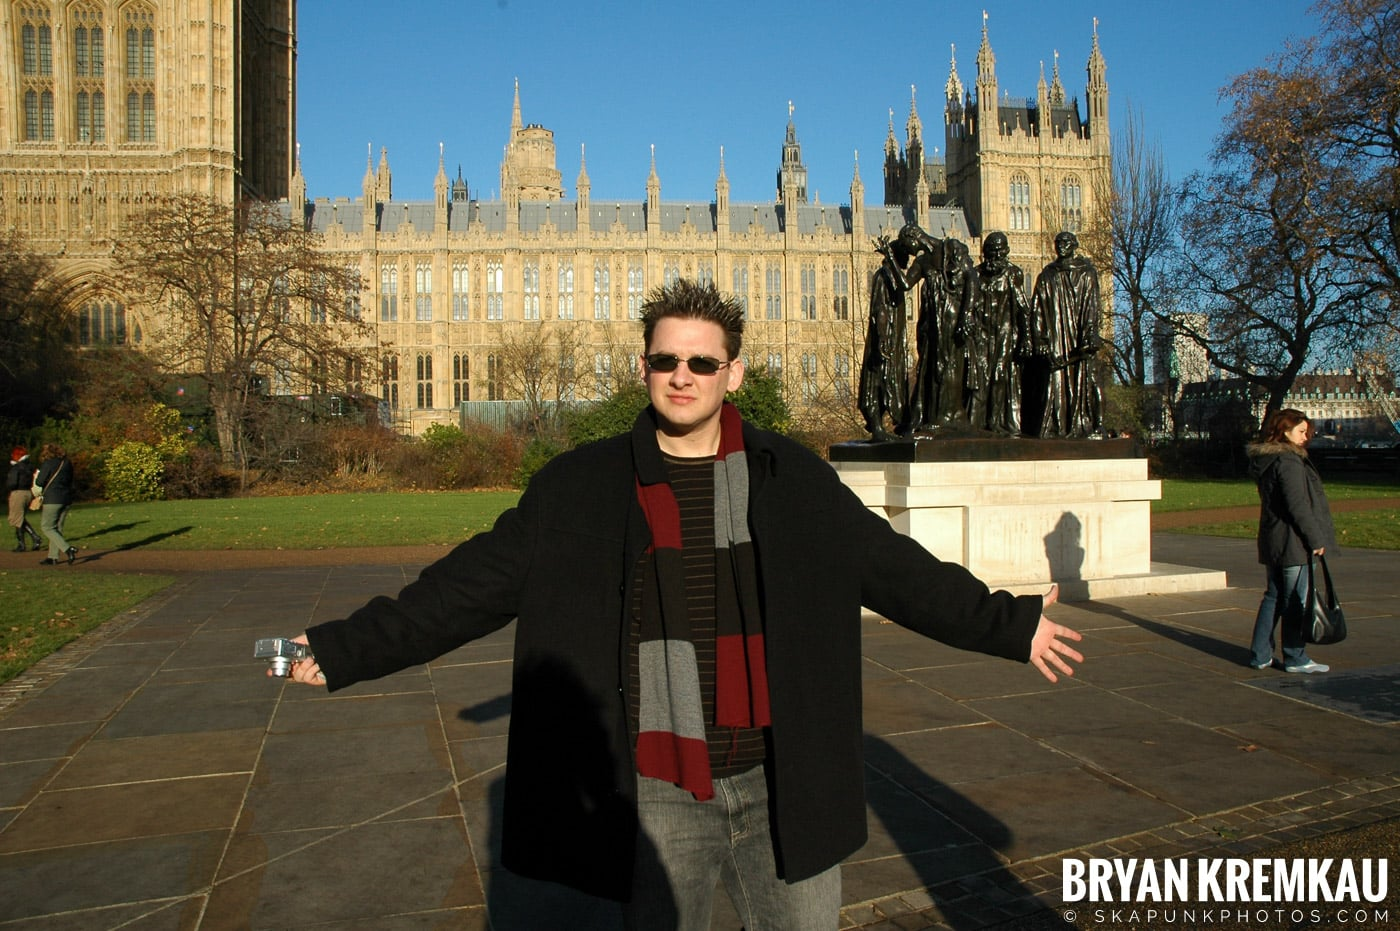 London, England - Day 4 - 12.19.05 (22)